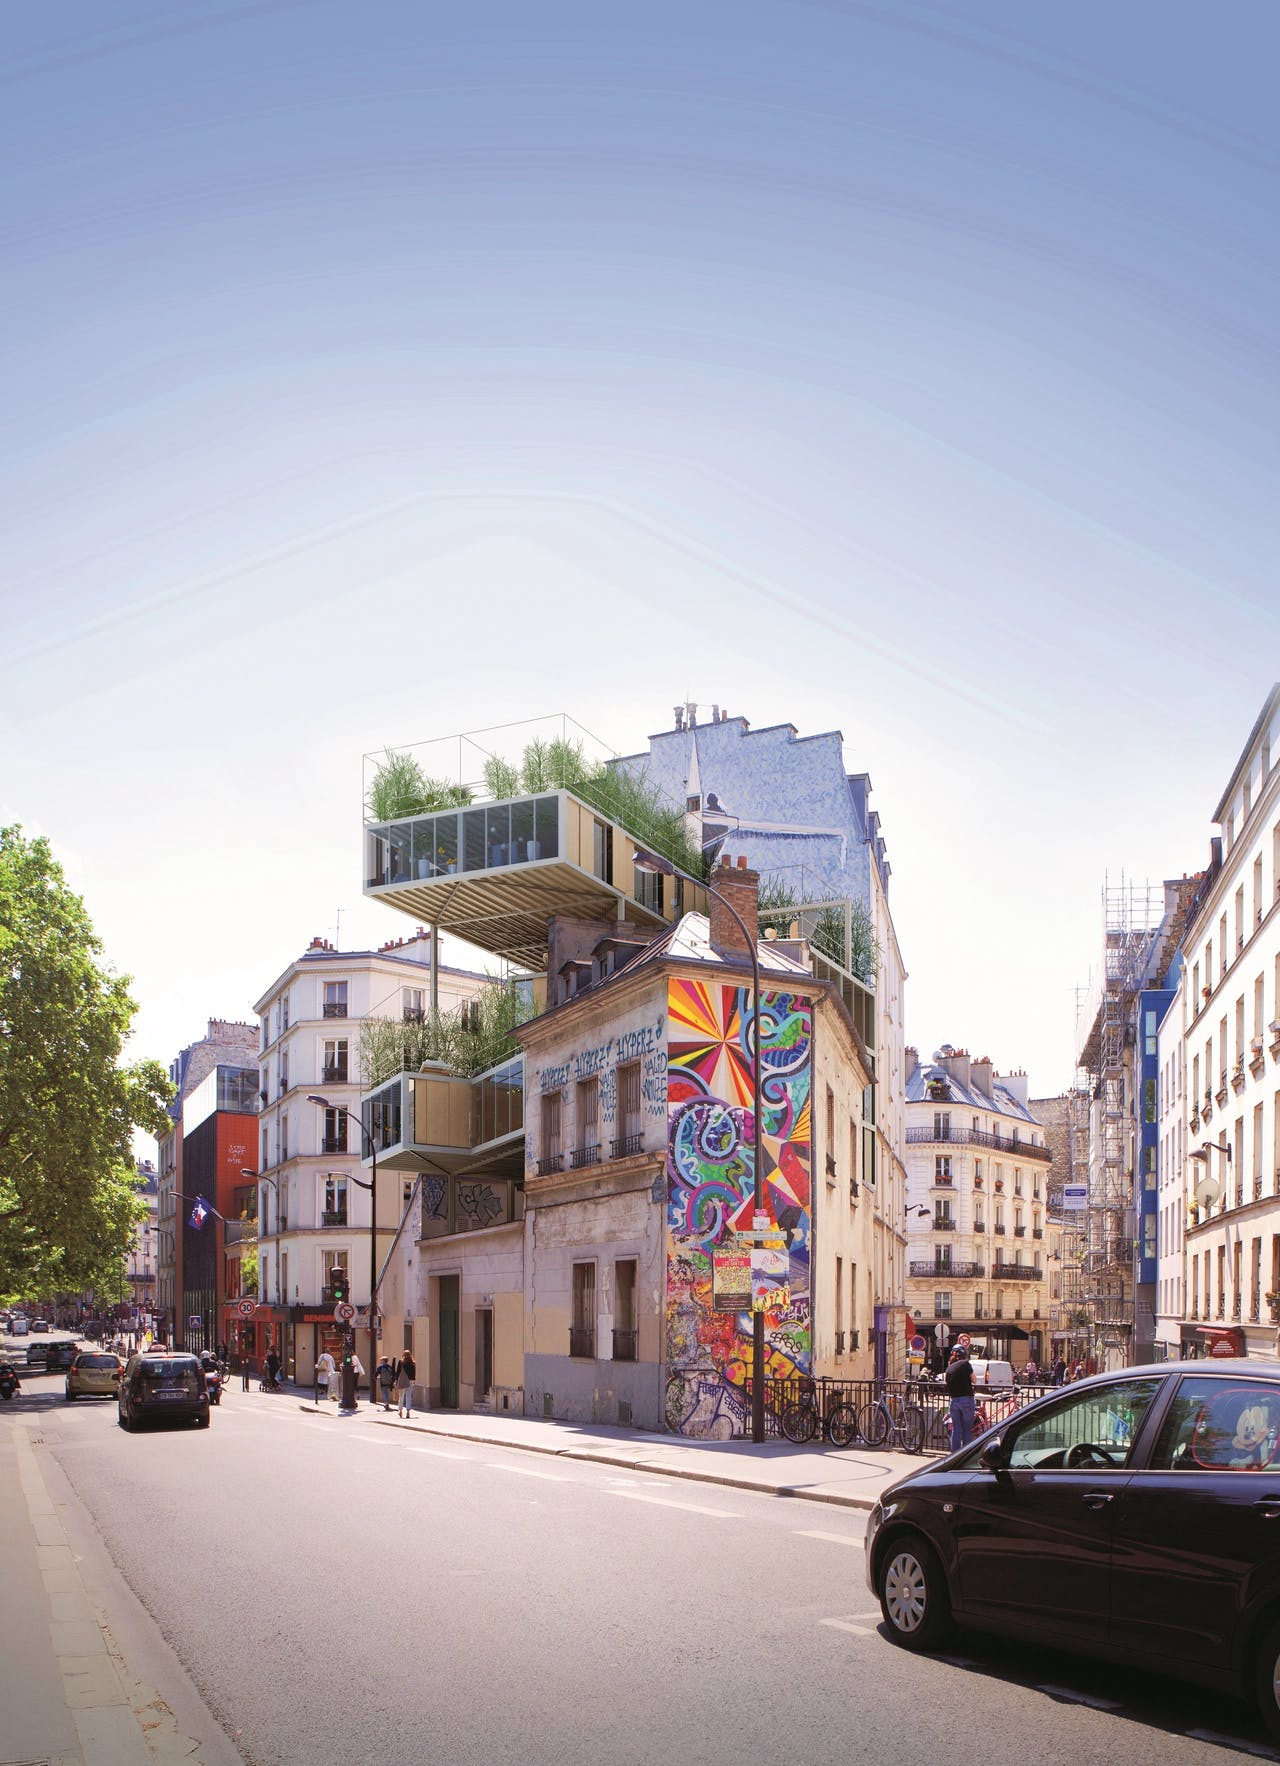 Architect Stephane Malka bouwde in Parijs nieuwe woningunits over bestaande huizen.